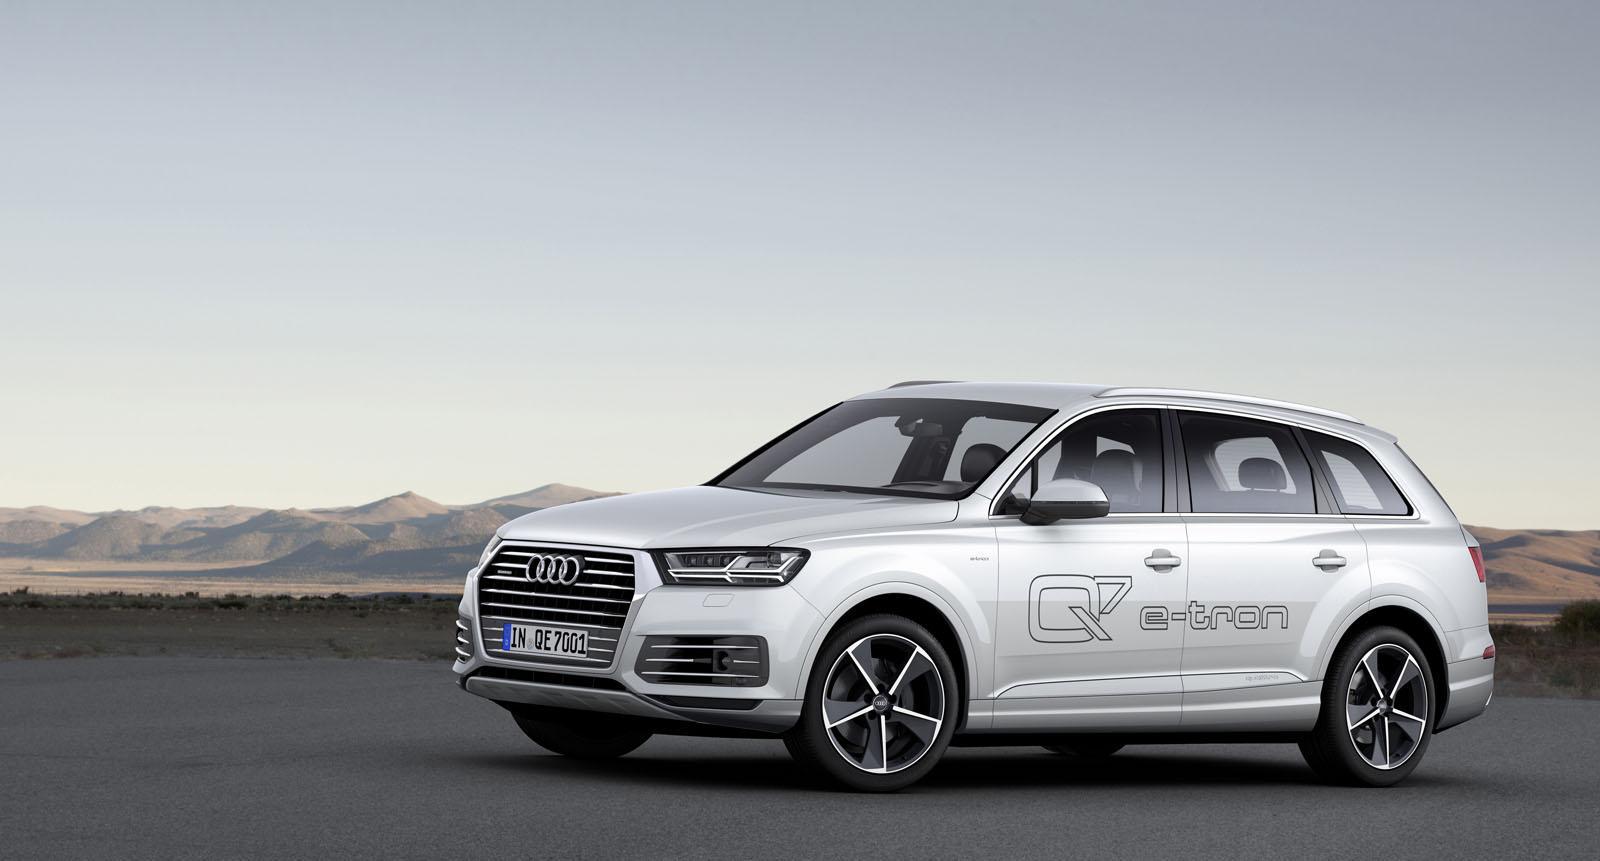 2016 Audi Q7 e-tron TDI